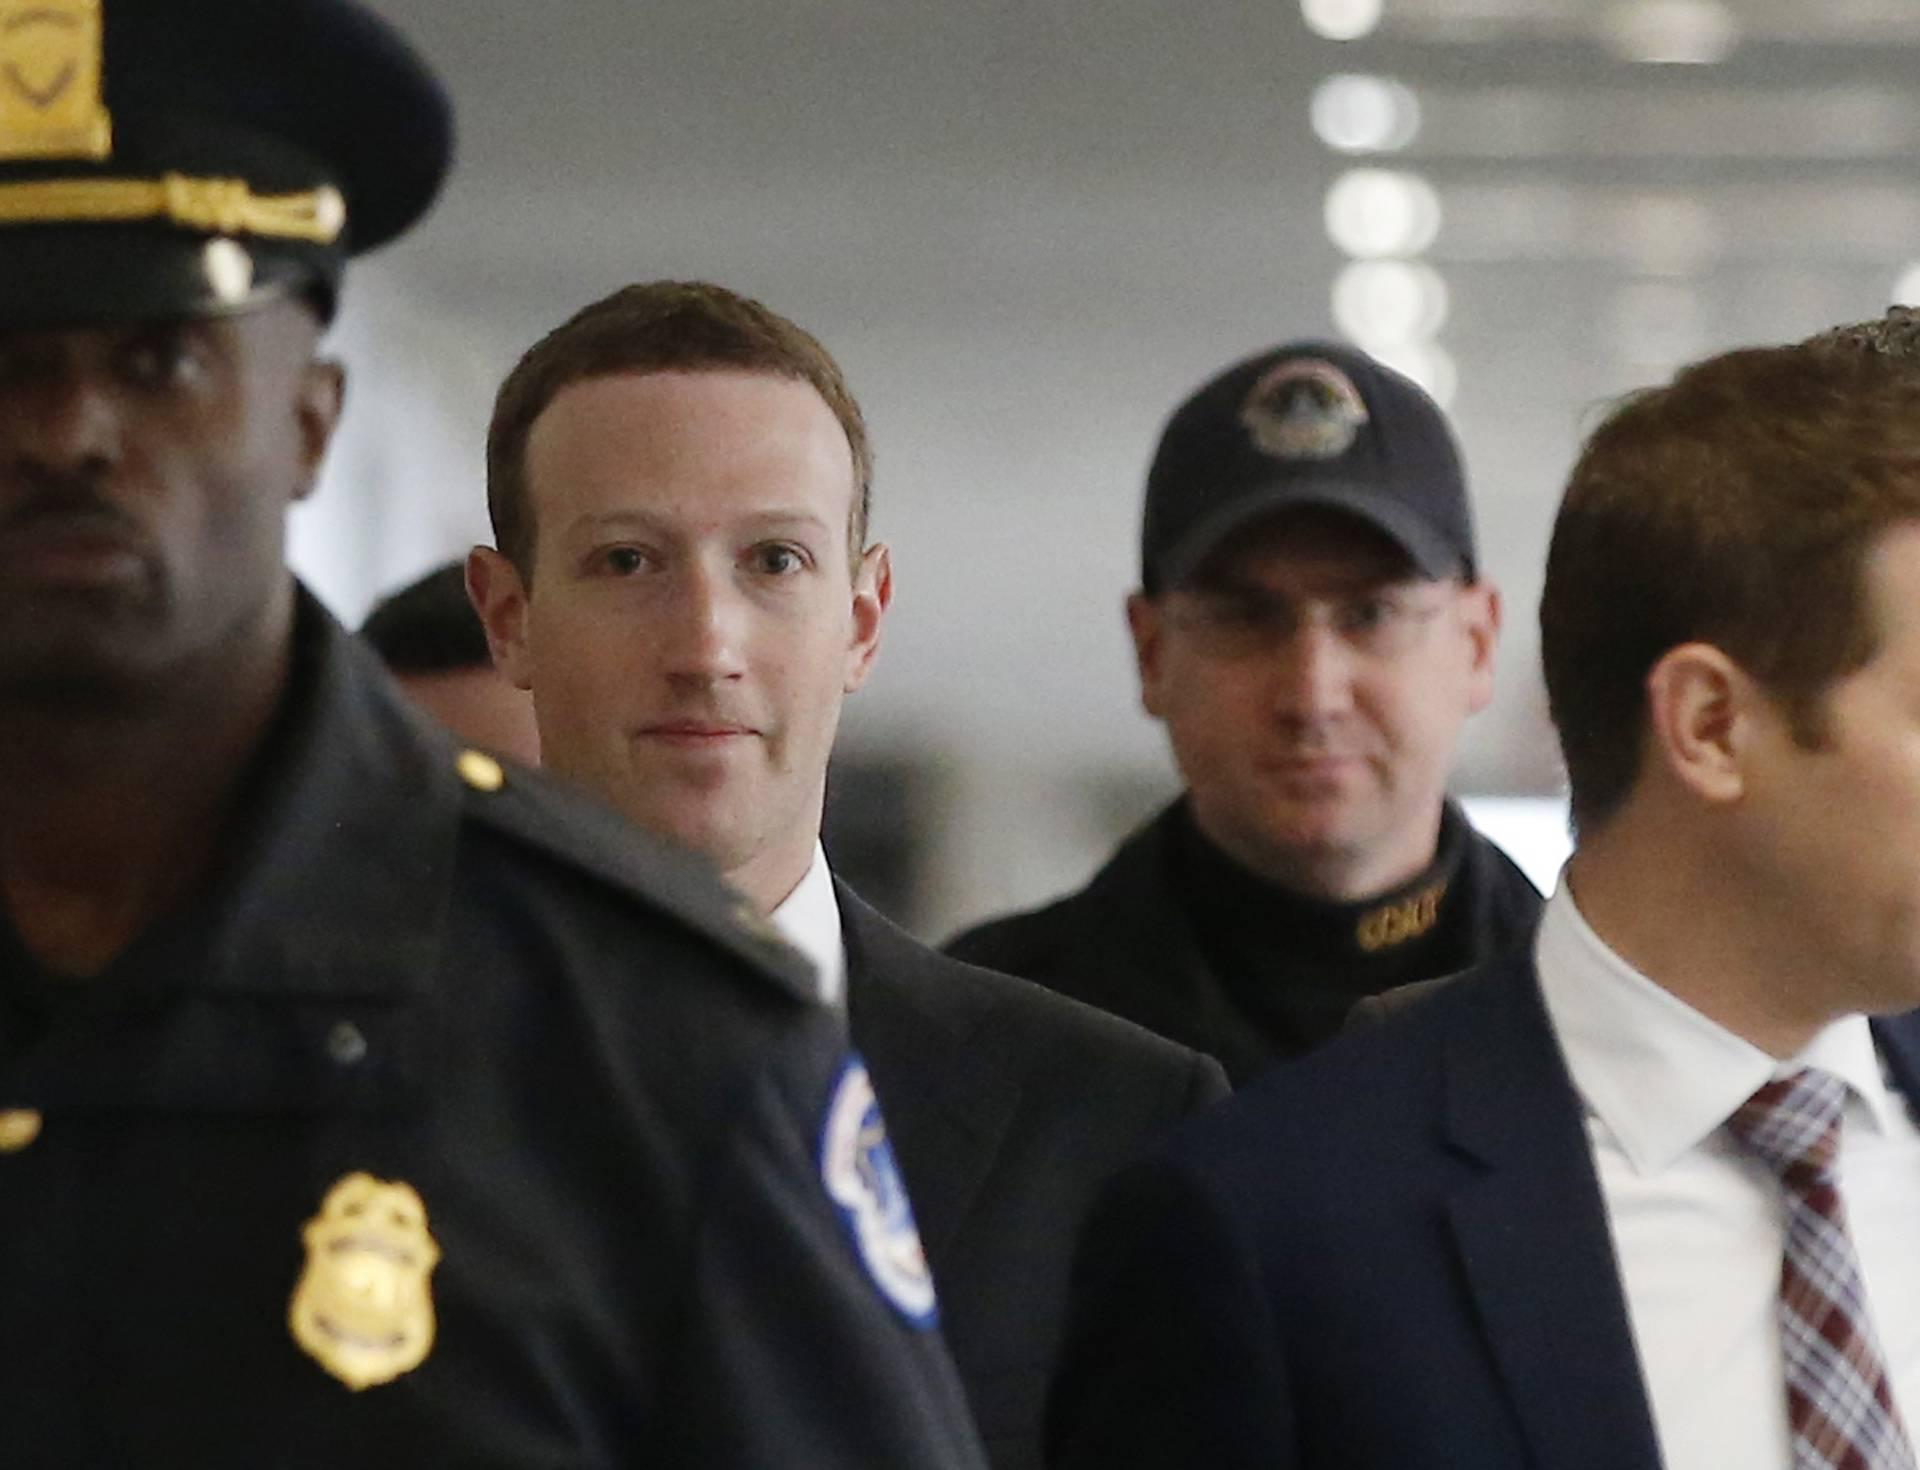 Mark Zuckerberg arrives for meeting with U.S. Senator Nelson on Capitol Hill in Washington